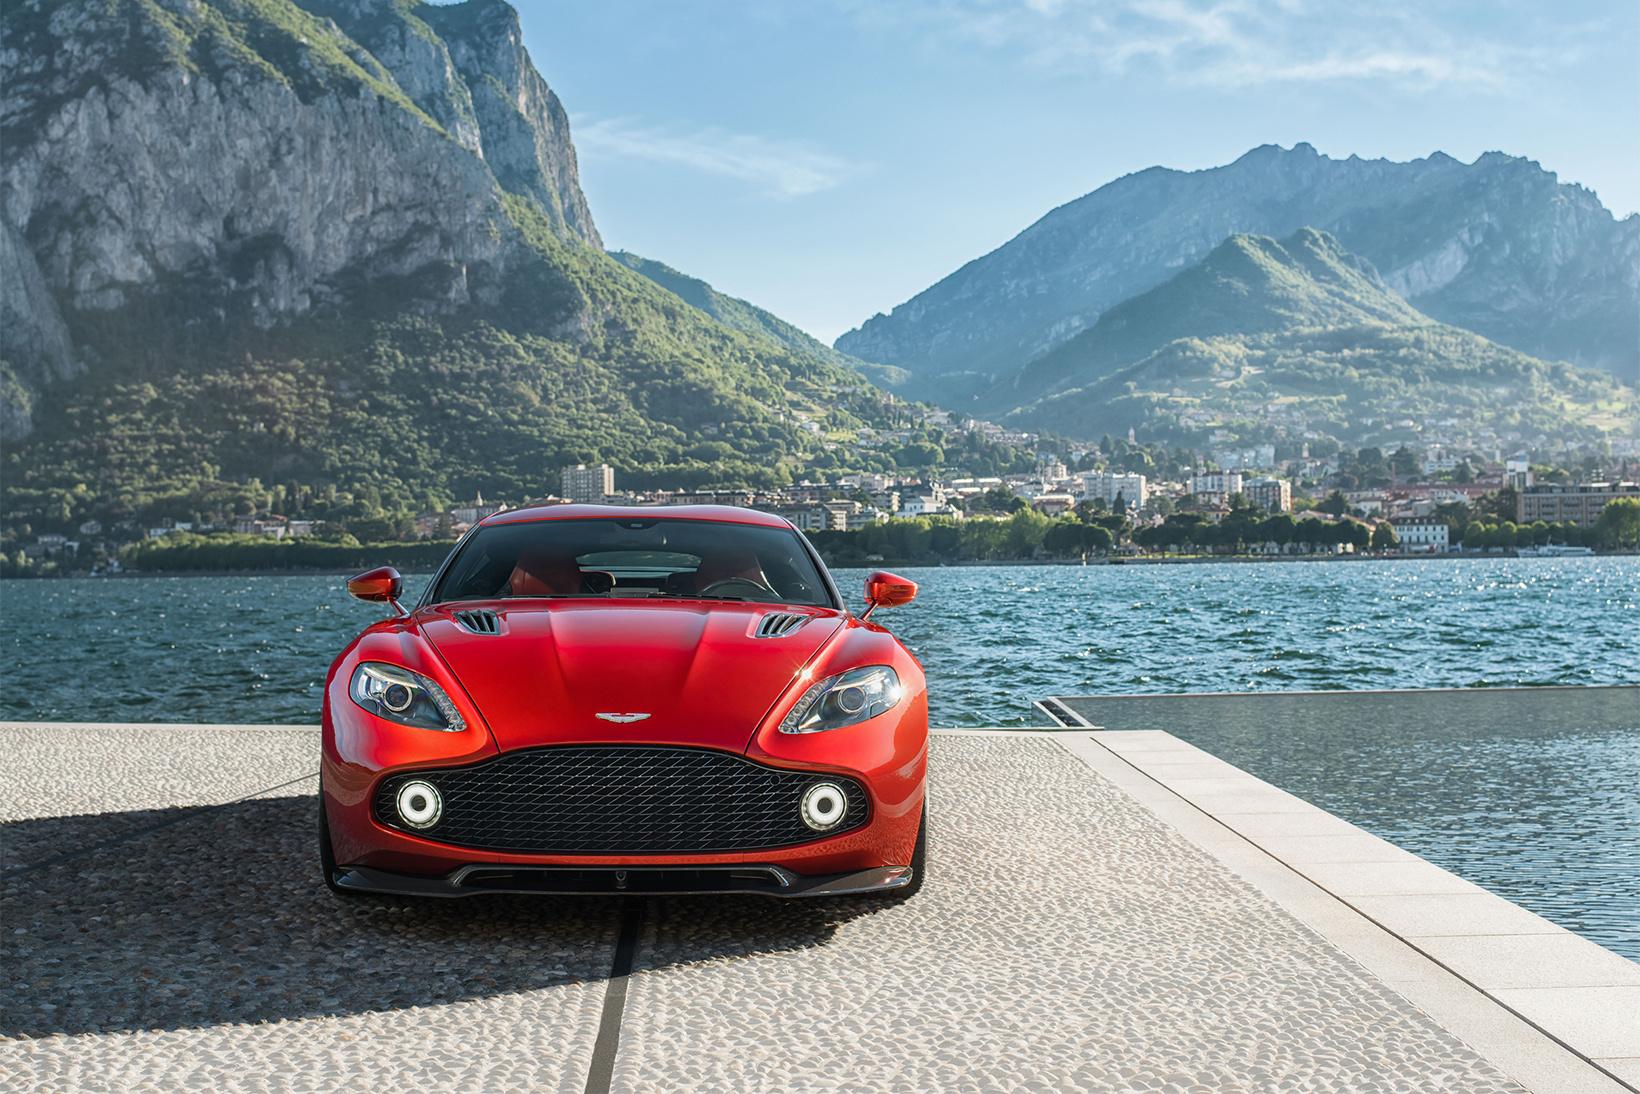 Aston Martin Vanquish Zagato Tech ALL - Aston martin vanquish zagato